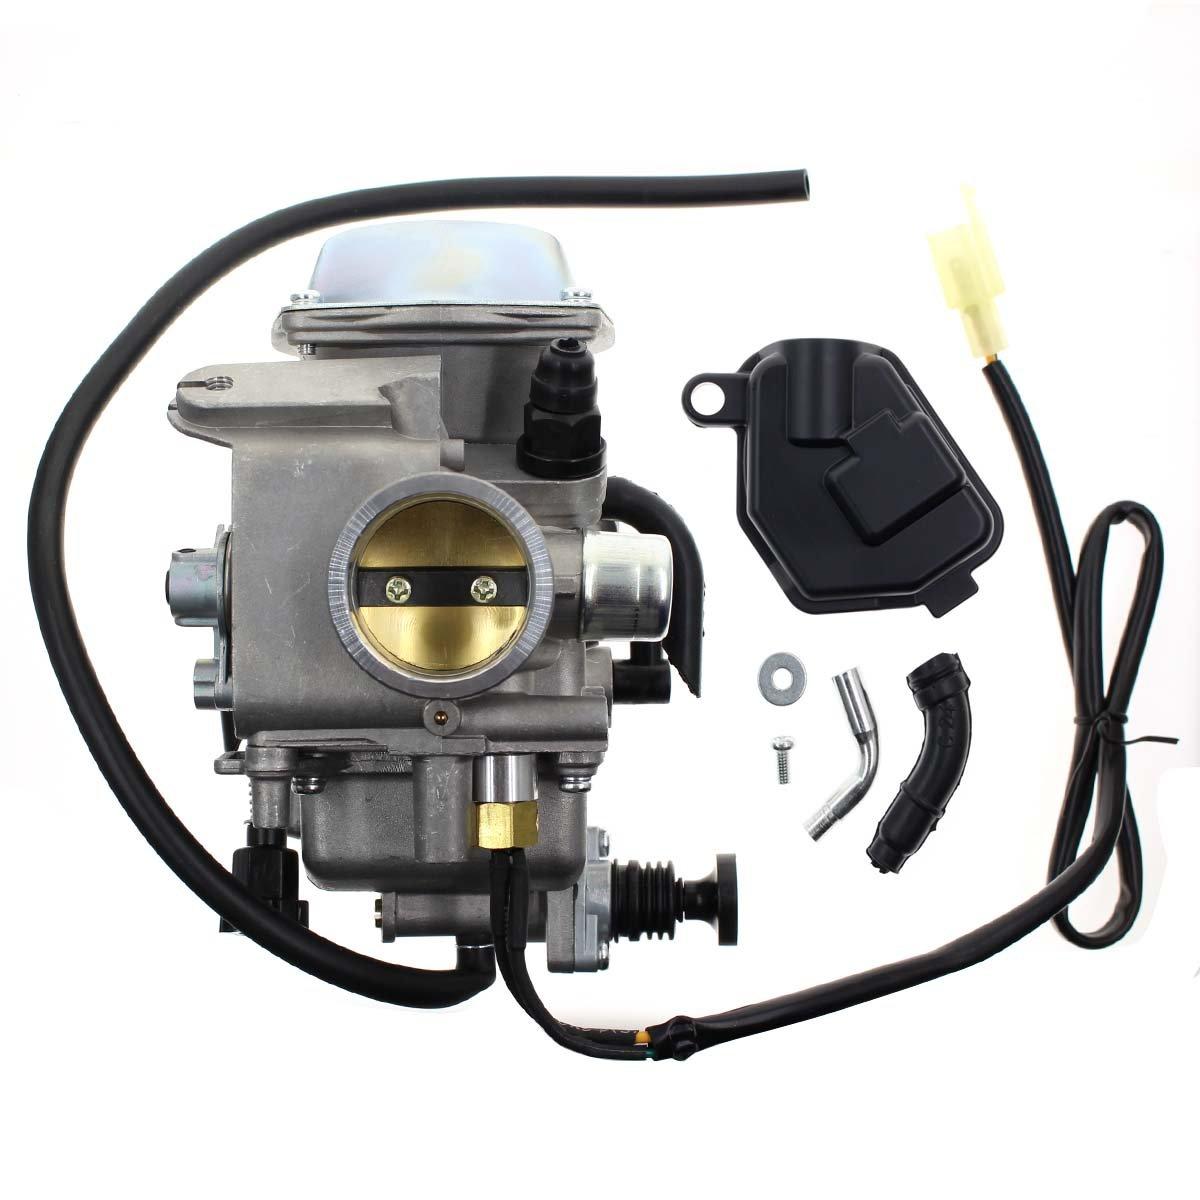 Carbhub Carburetor for Honda Foreman 450 TRX 450 TRX450ES TRX450FE TRX450FM TRX450S 1998-2004 Aftermarket Carb with Throttle Base Cover & Screw by Carbhub